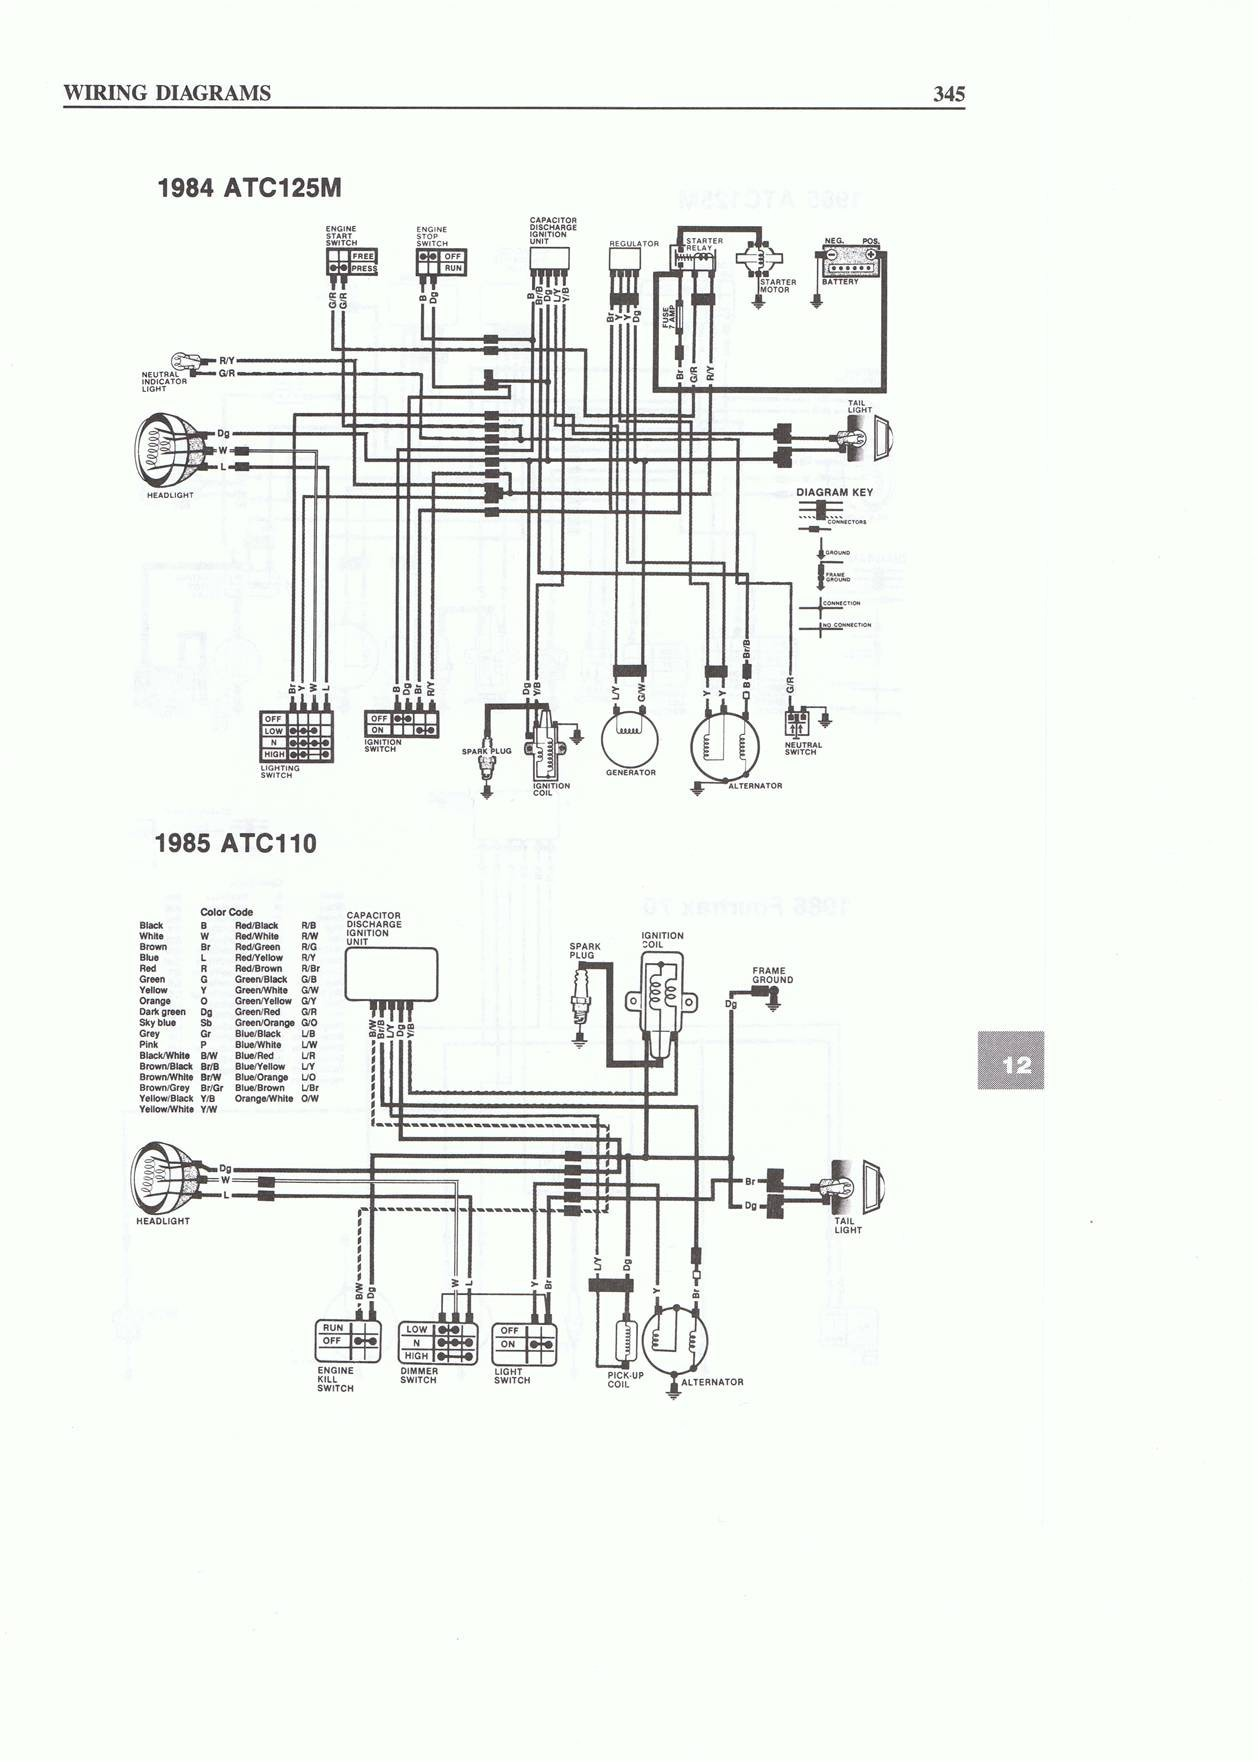 Peugeot 206 Speaker Wiring Diagram Trusted Diagrams 8 Ohm Series Parallel Chinese Quad Unique Image Crutchfield Guitar